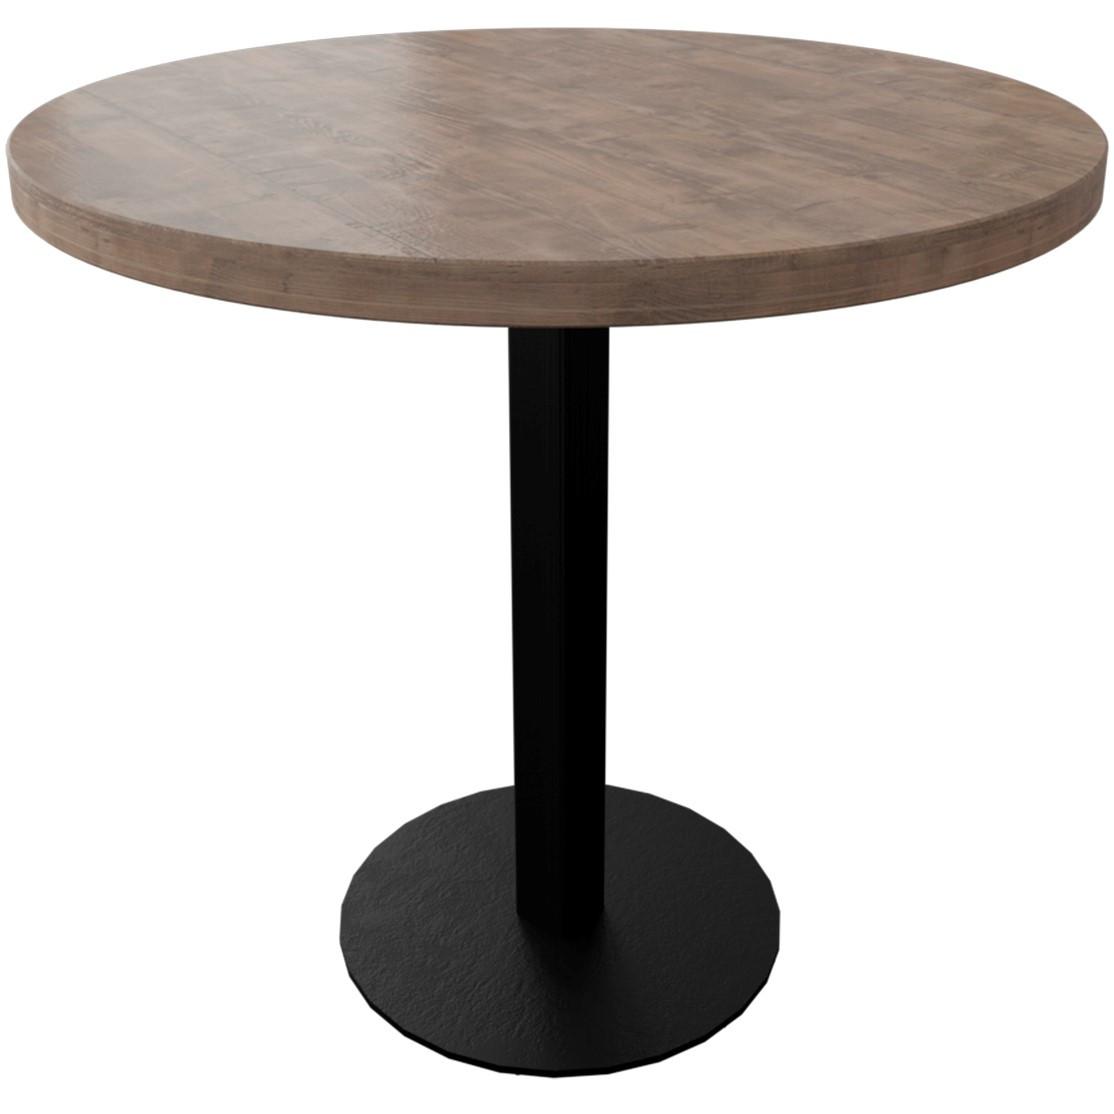 Стол Тренд 2 (серия Loft) ТМ Металл-Дизайн